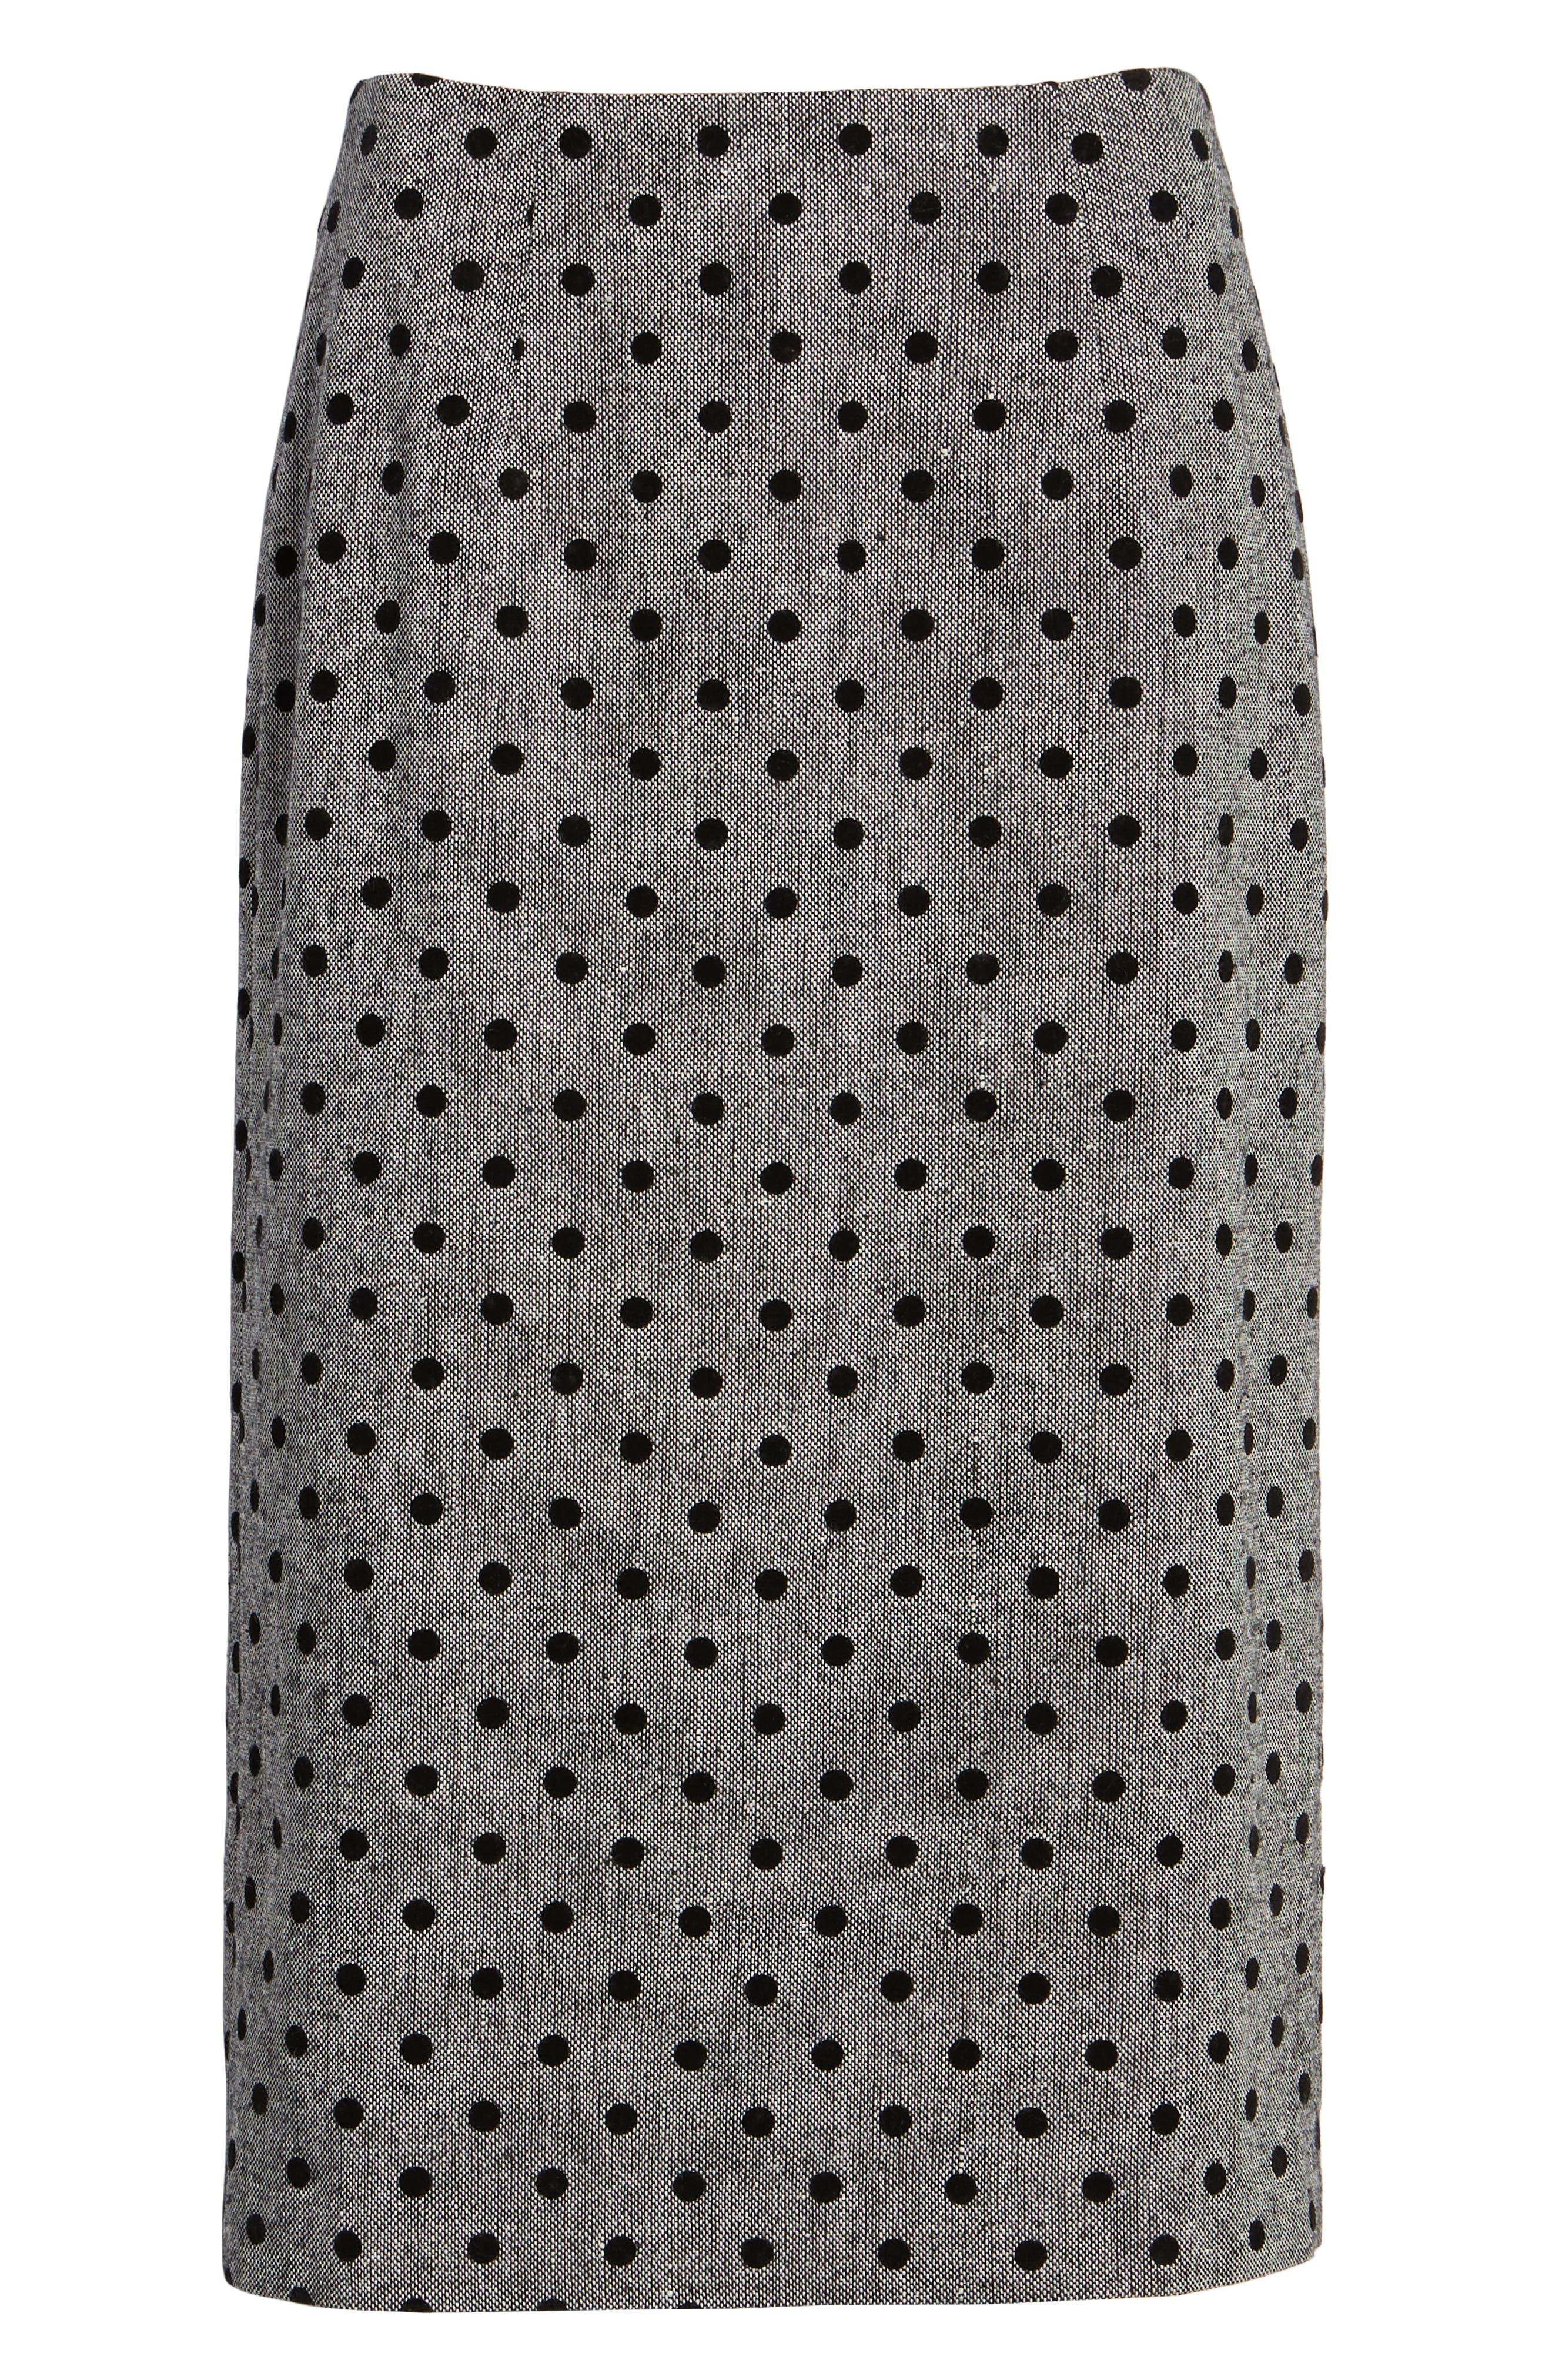 Dot Pencil Skirt,                             Alternate thumbnail 6, color,                             030